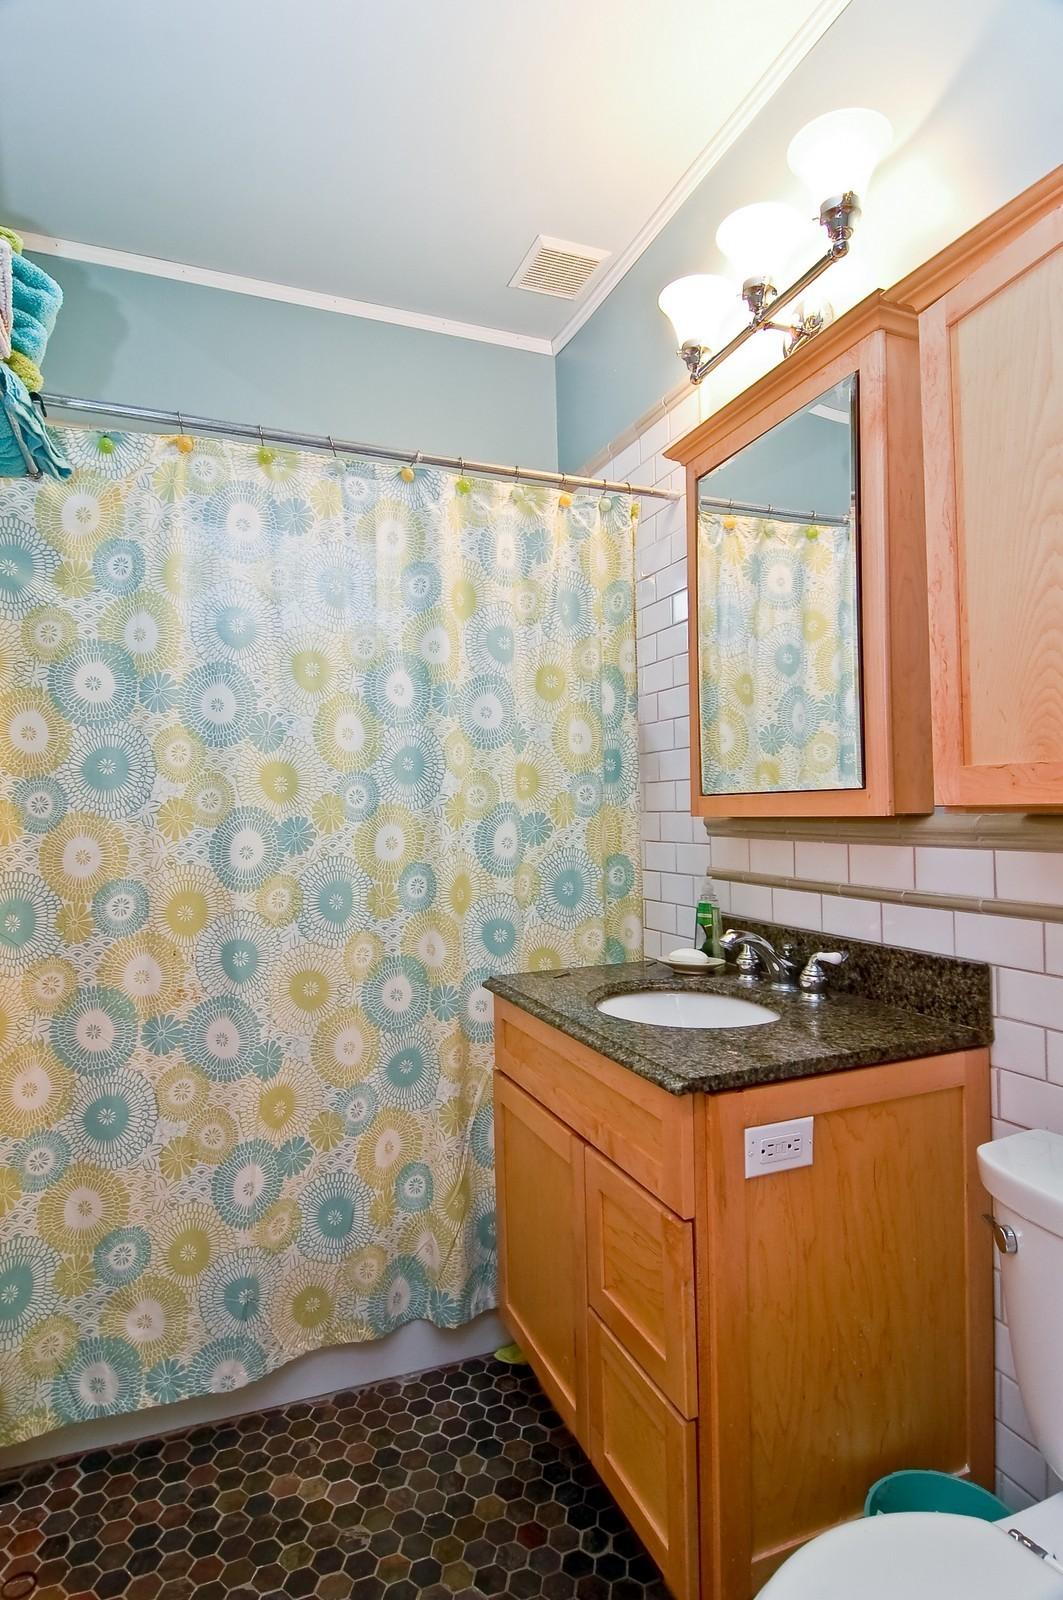 Real Estate Photography - 5012 Upton Avenue South, Minneapolis, MN, 55410 - Bathroom